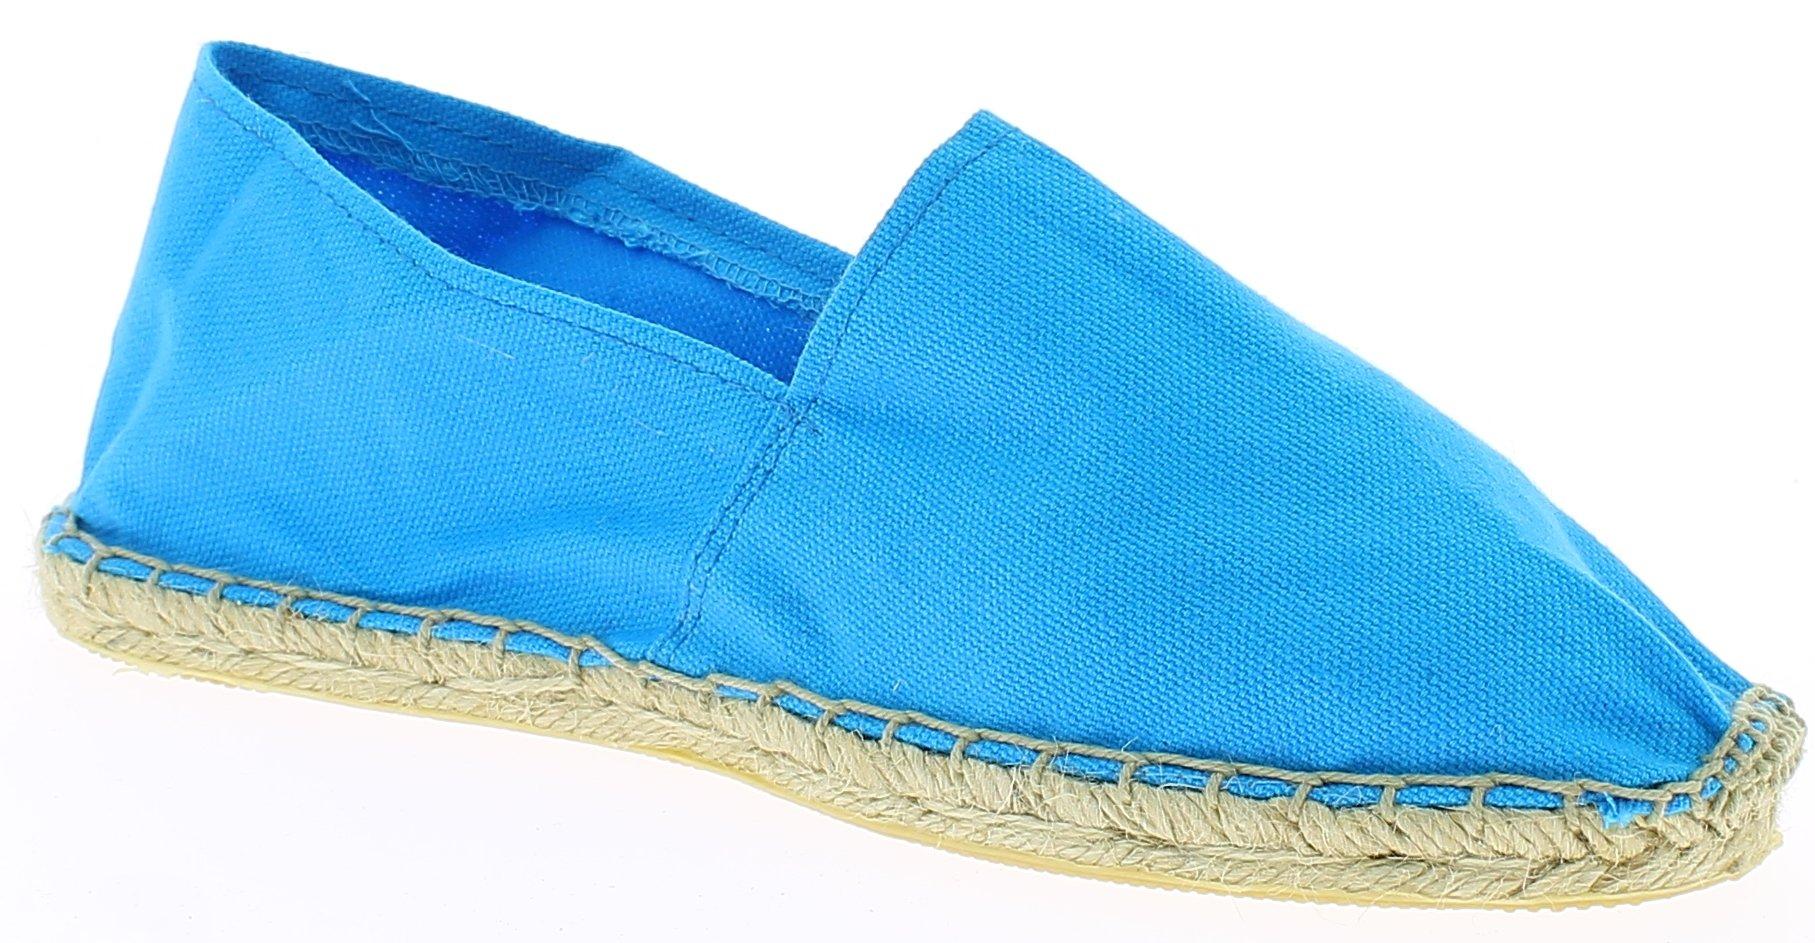 MADIGAN Γυναικεία Casual ESPAGNA Τιρκουάζ - IqShoes - ESPAGA TURCOISE-blue-37/1/ προϊόντα παπούτσια